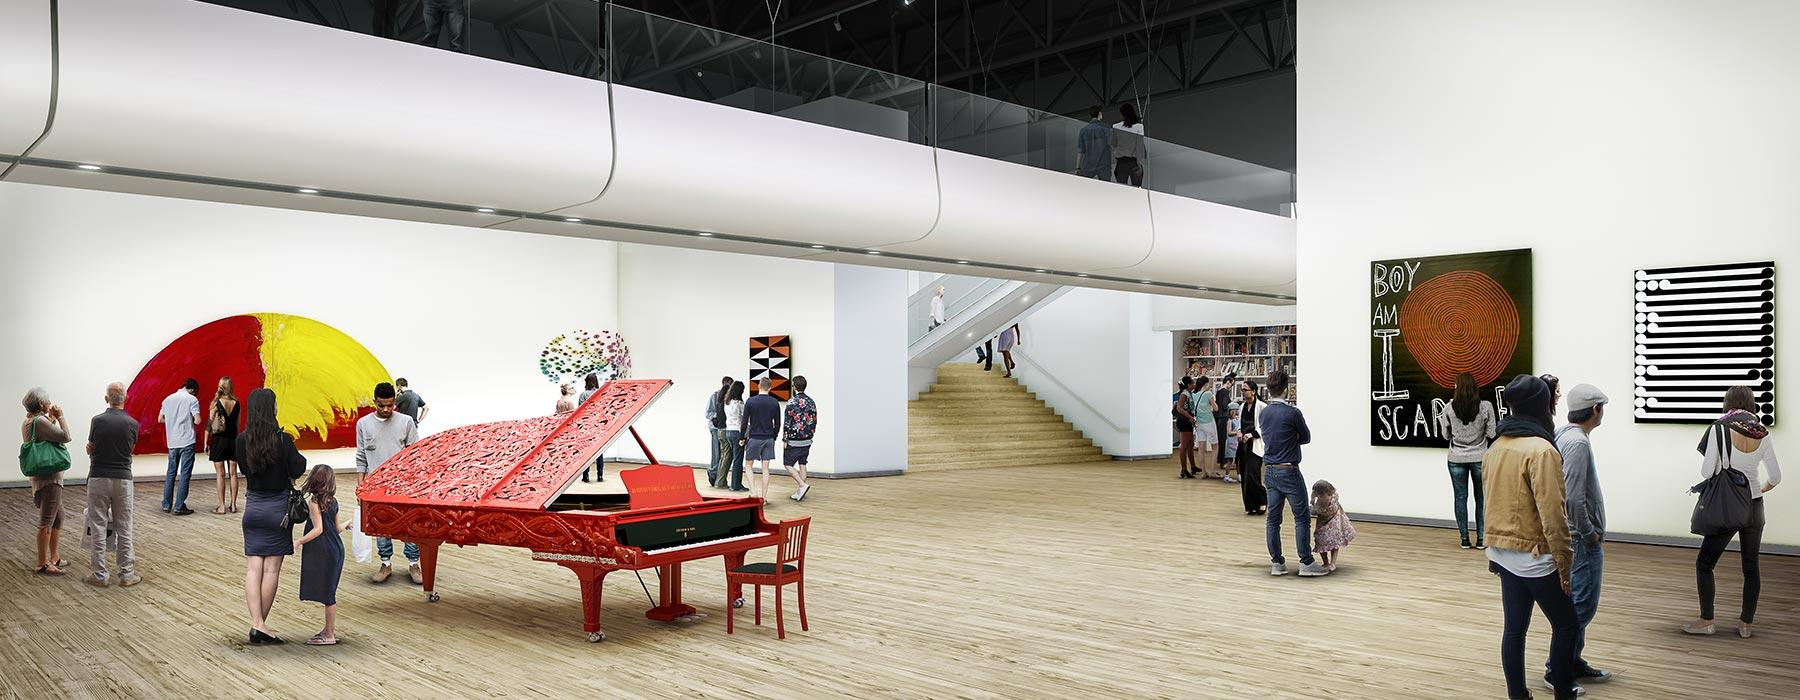 Rendering of new art space